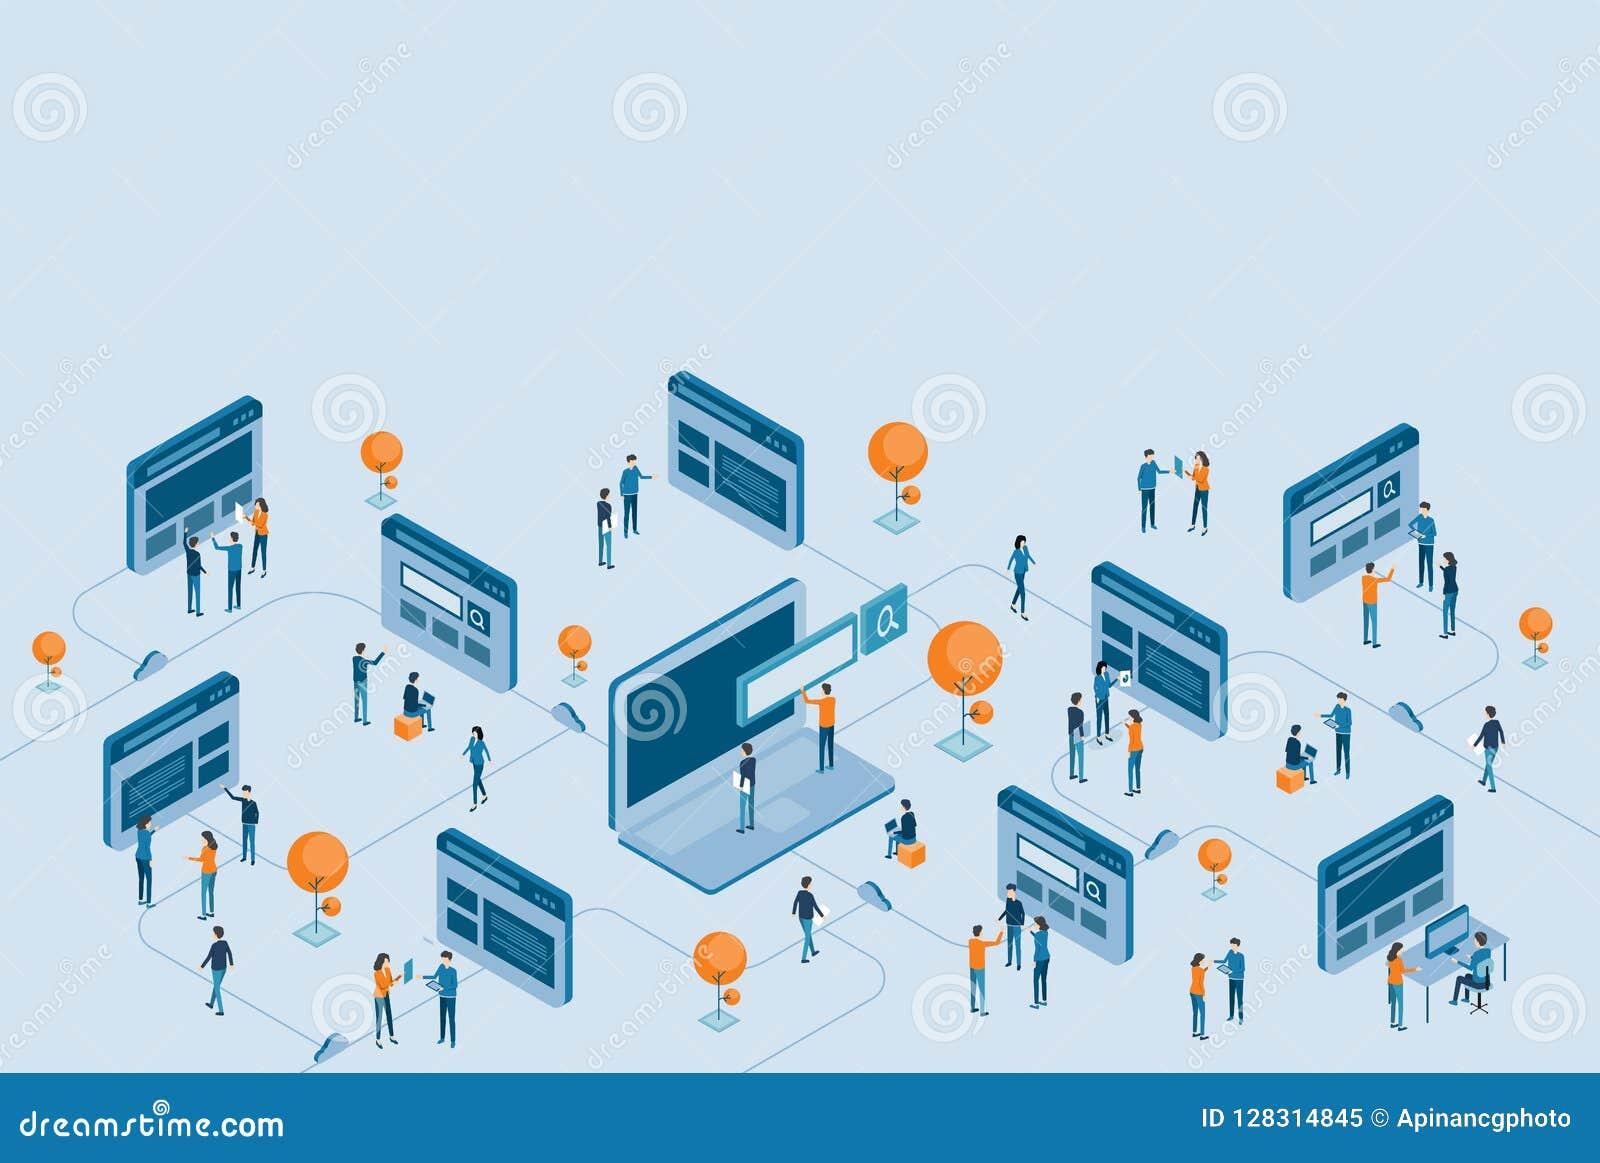 Isometric ανάπτυξη σχεδίου ιστοσελίδας και ψηφιακή επιχειρησιακή σε απευθείας σύνδεση έρευνα